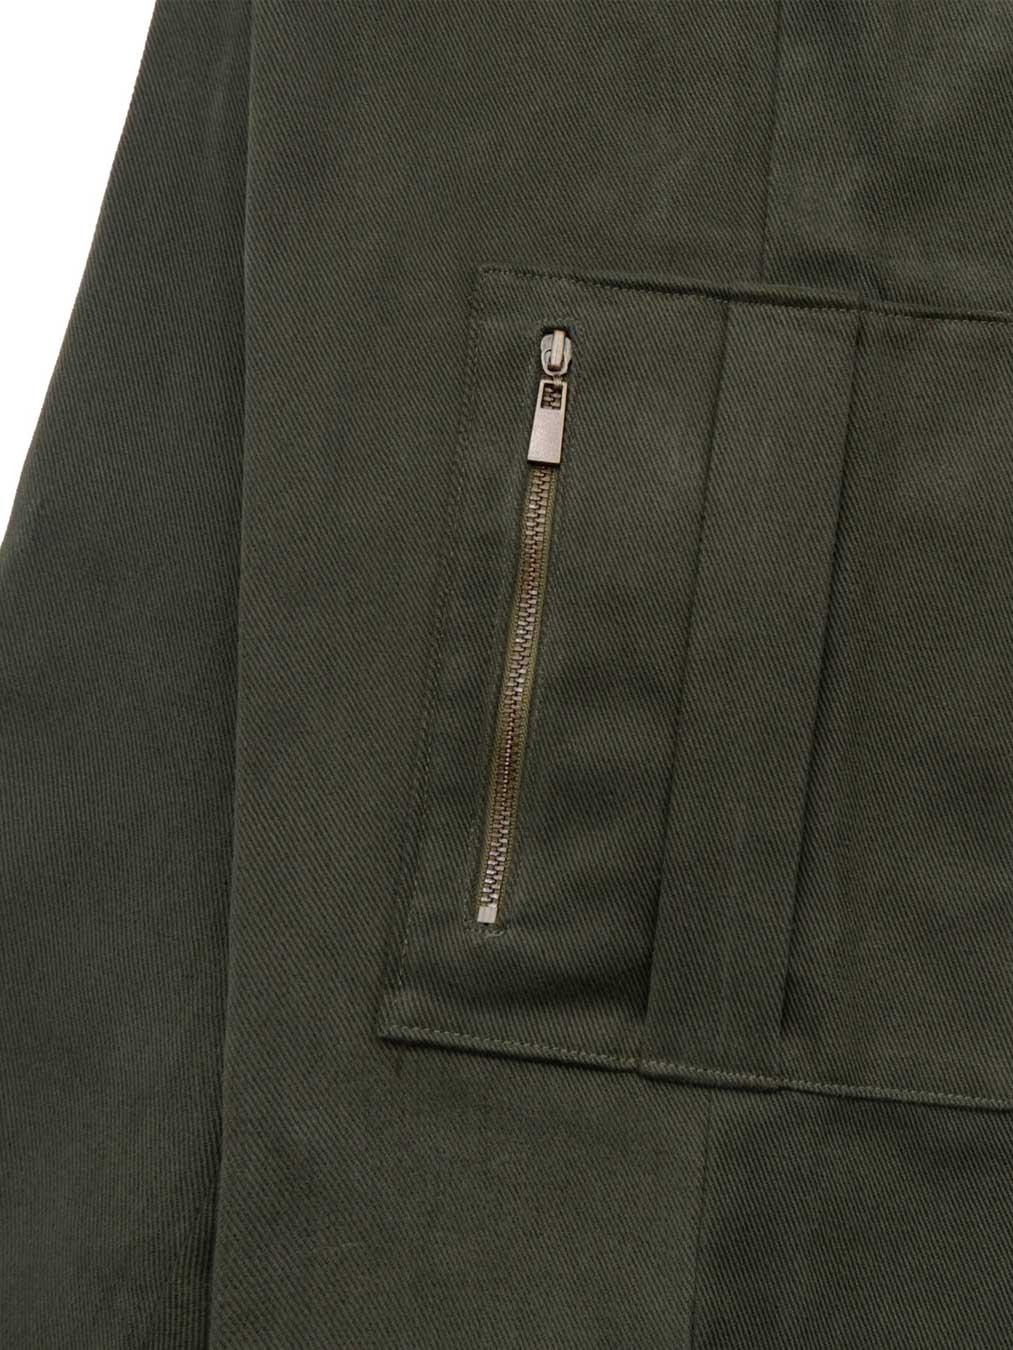 Cargo Pants (Olive)